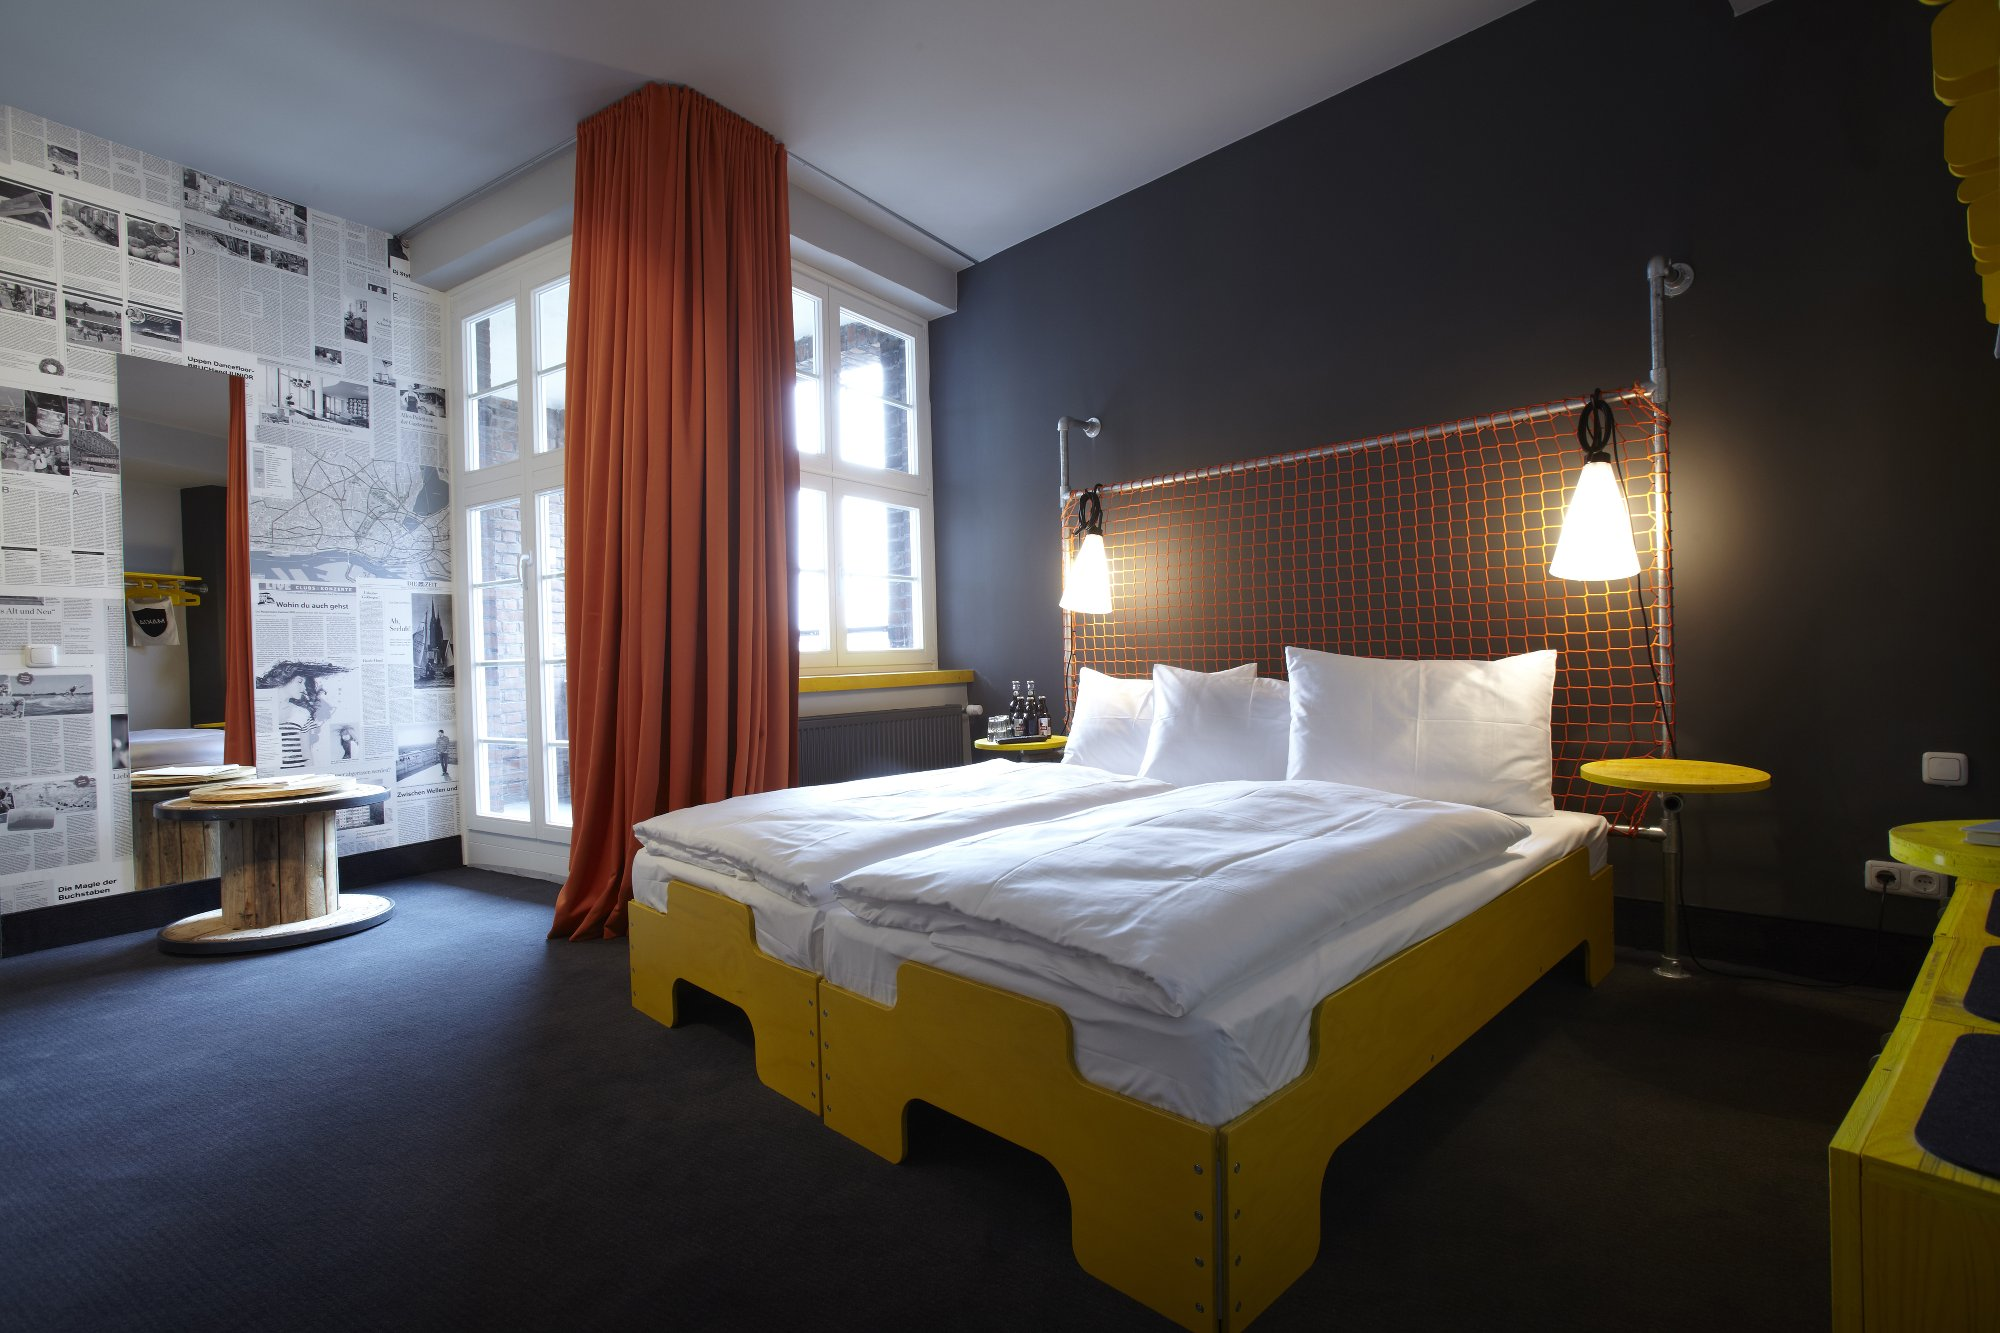 hamburgs bestes surf hotel prime surfing. Black Bedroom Furniture Sets. Home Design Ideas